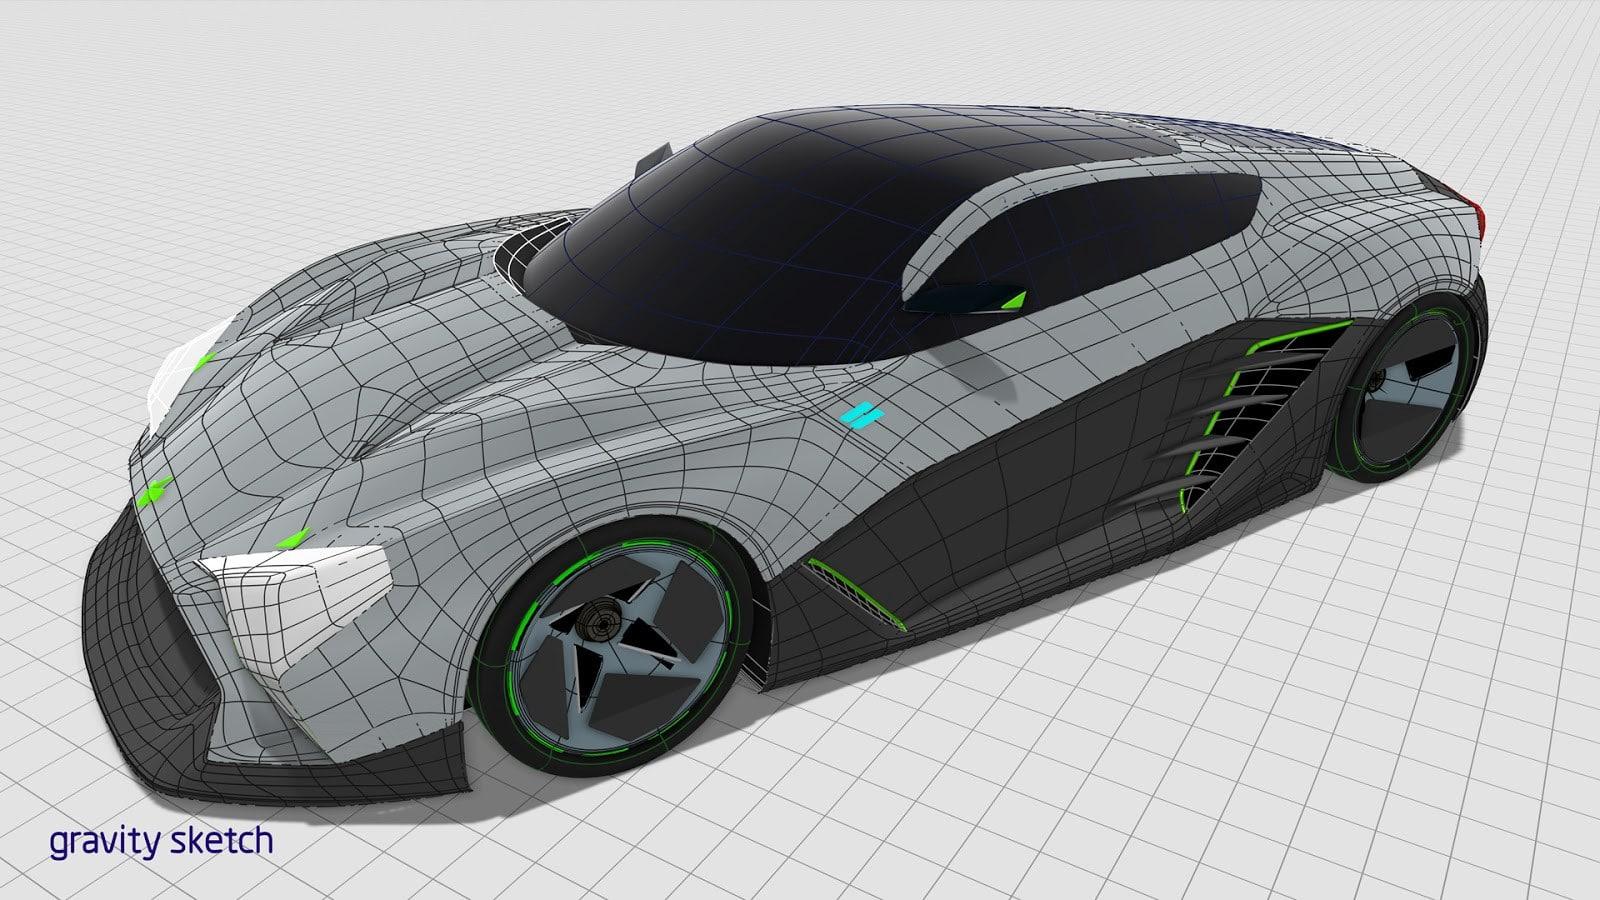 Design of car made in Gravity Sketch by James Robbins, Senior Designer at Honda R&D